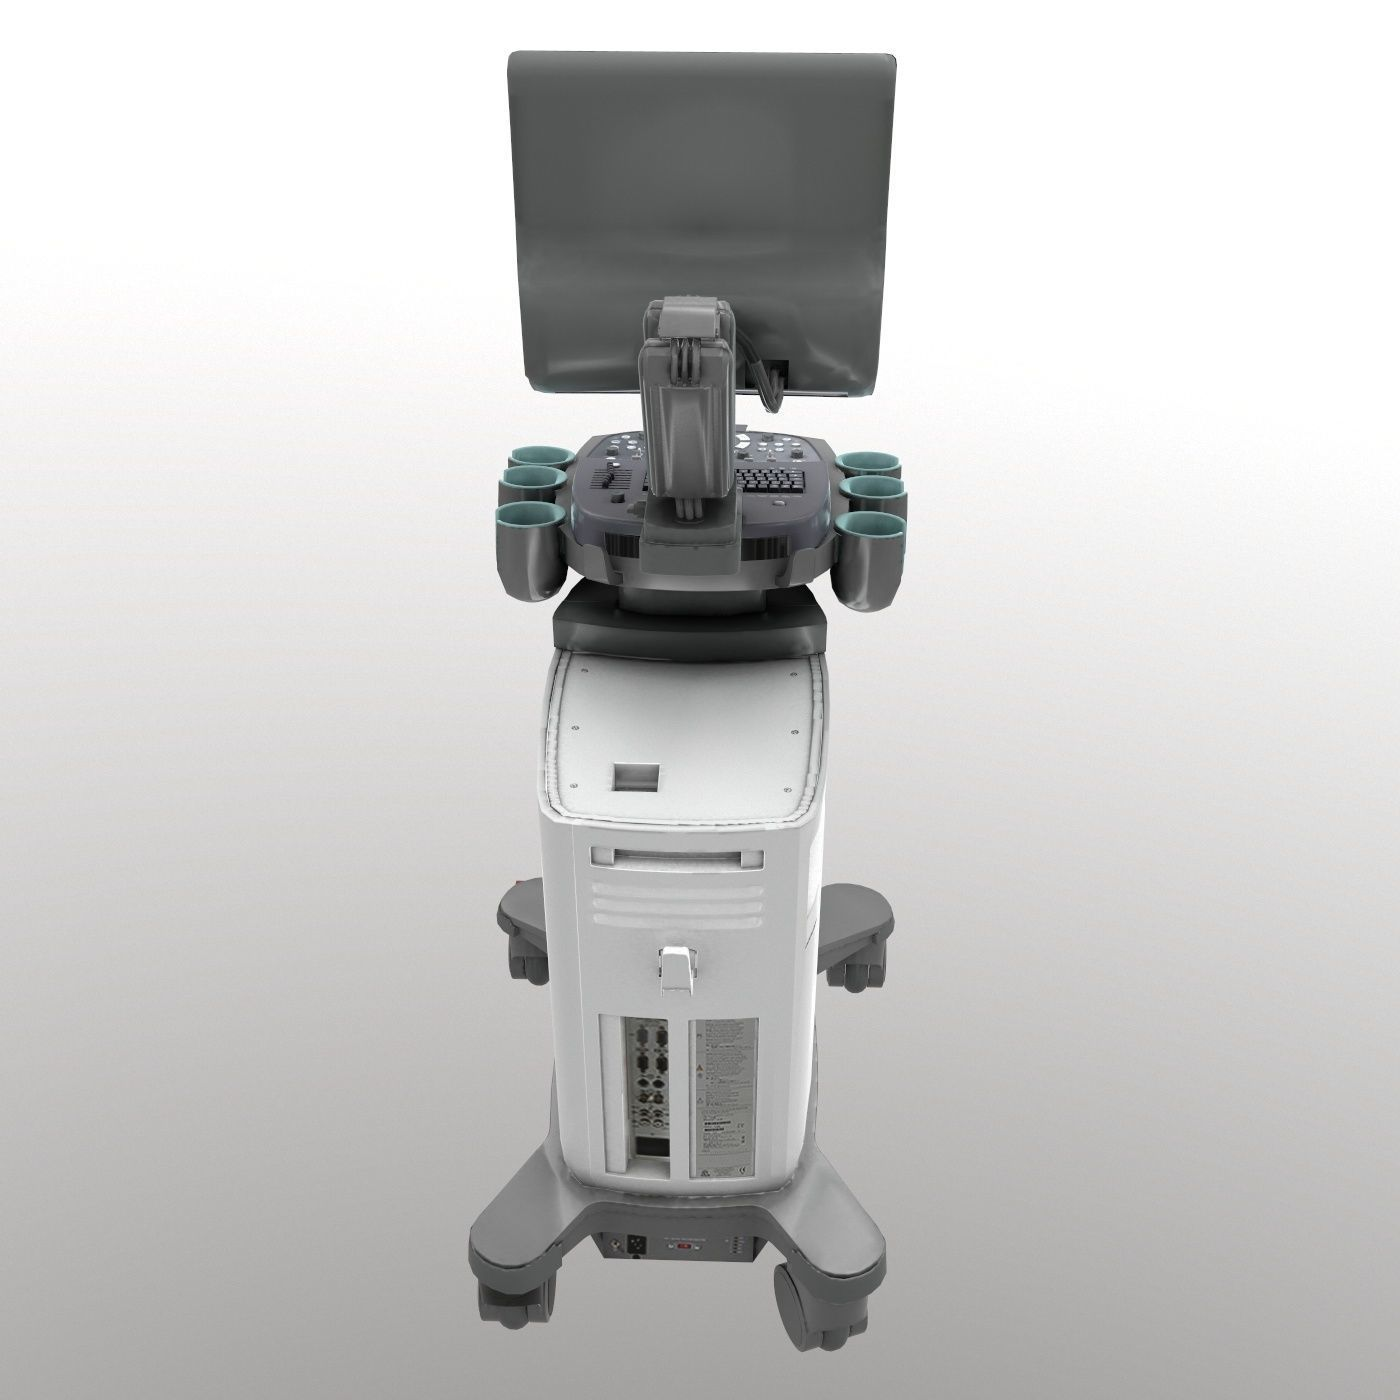 Ultrasound system Siemens-x300pe